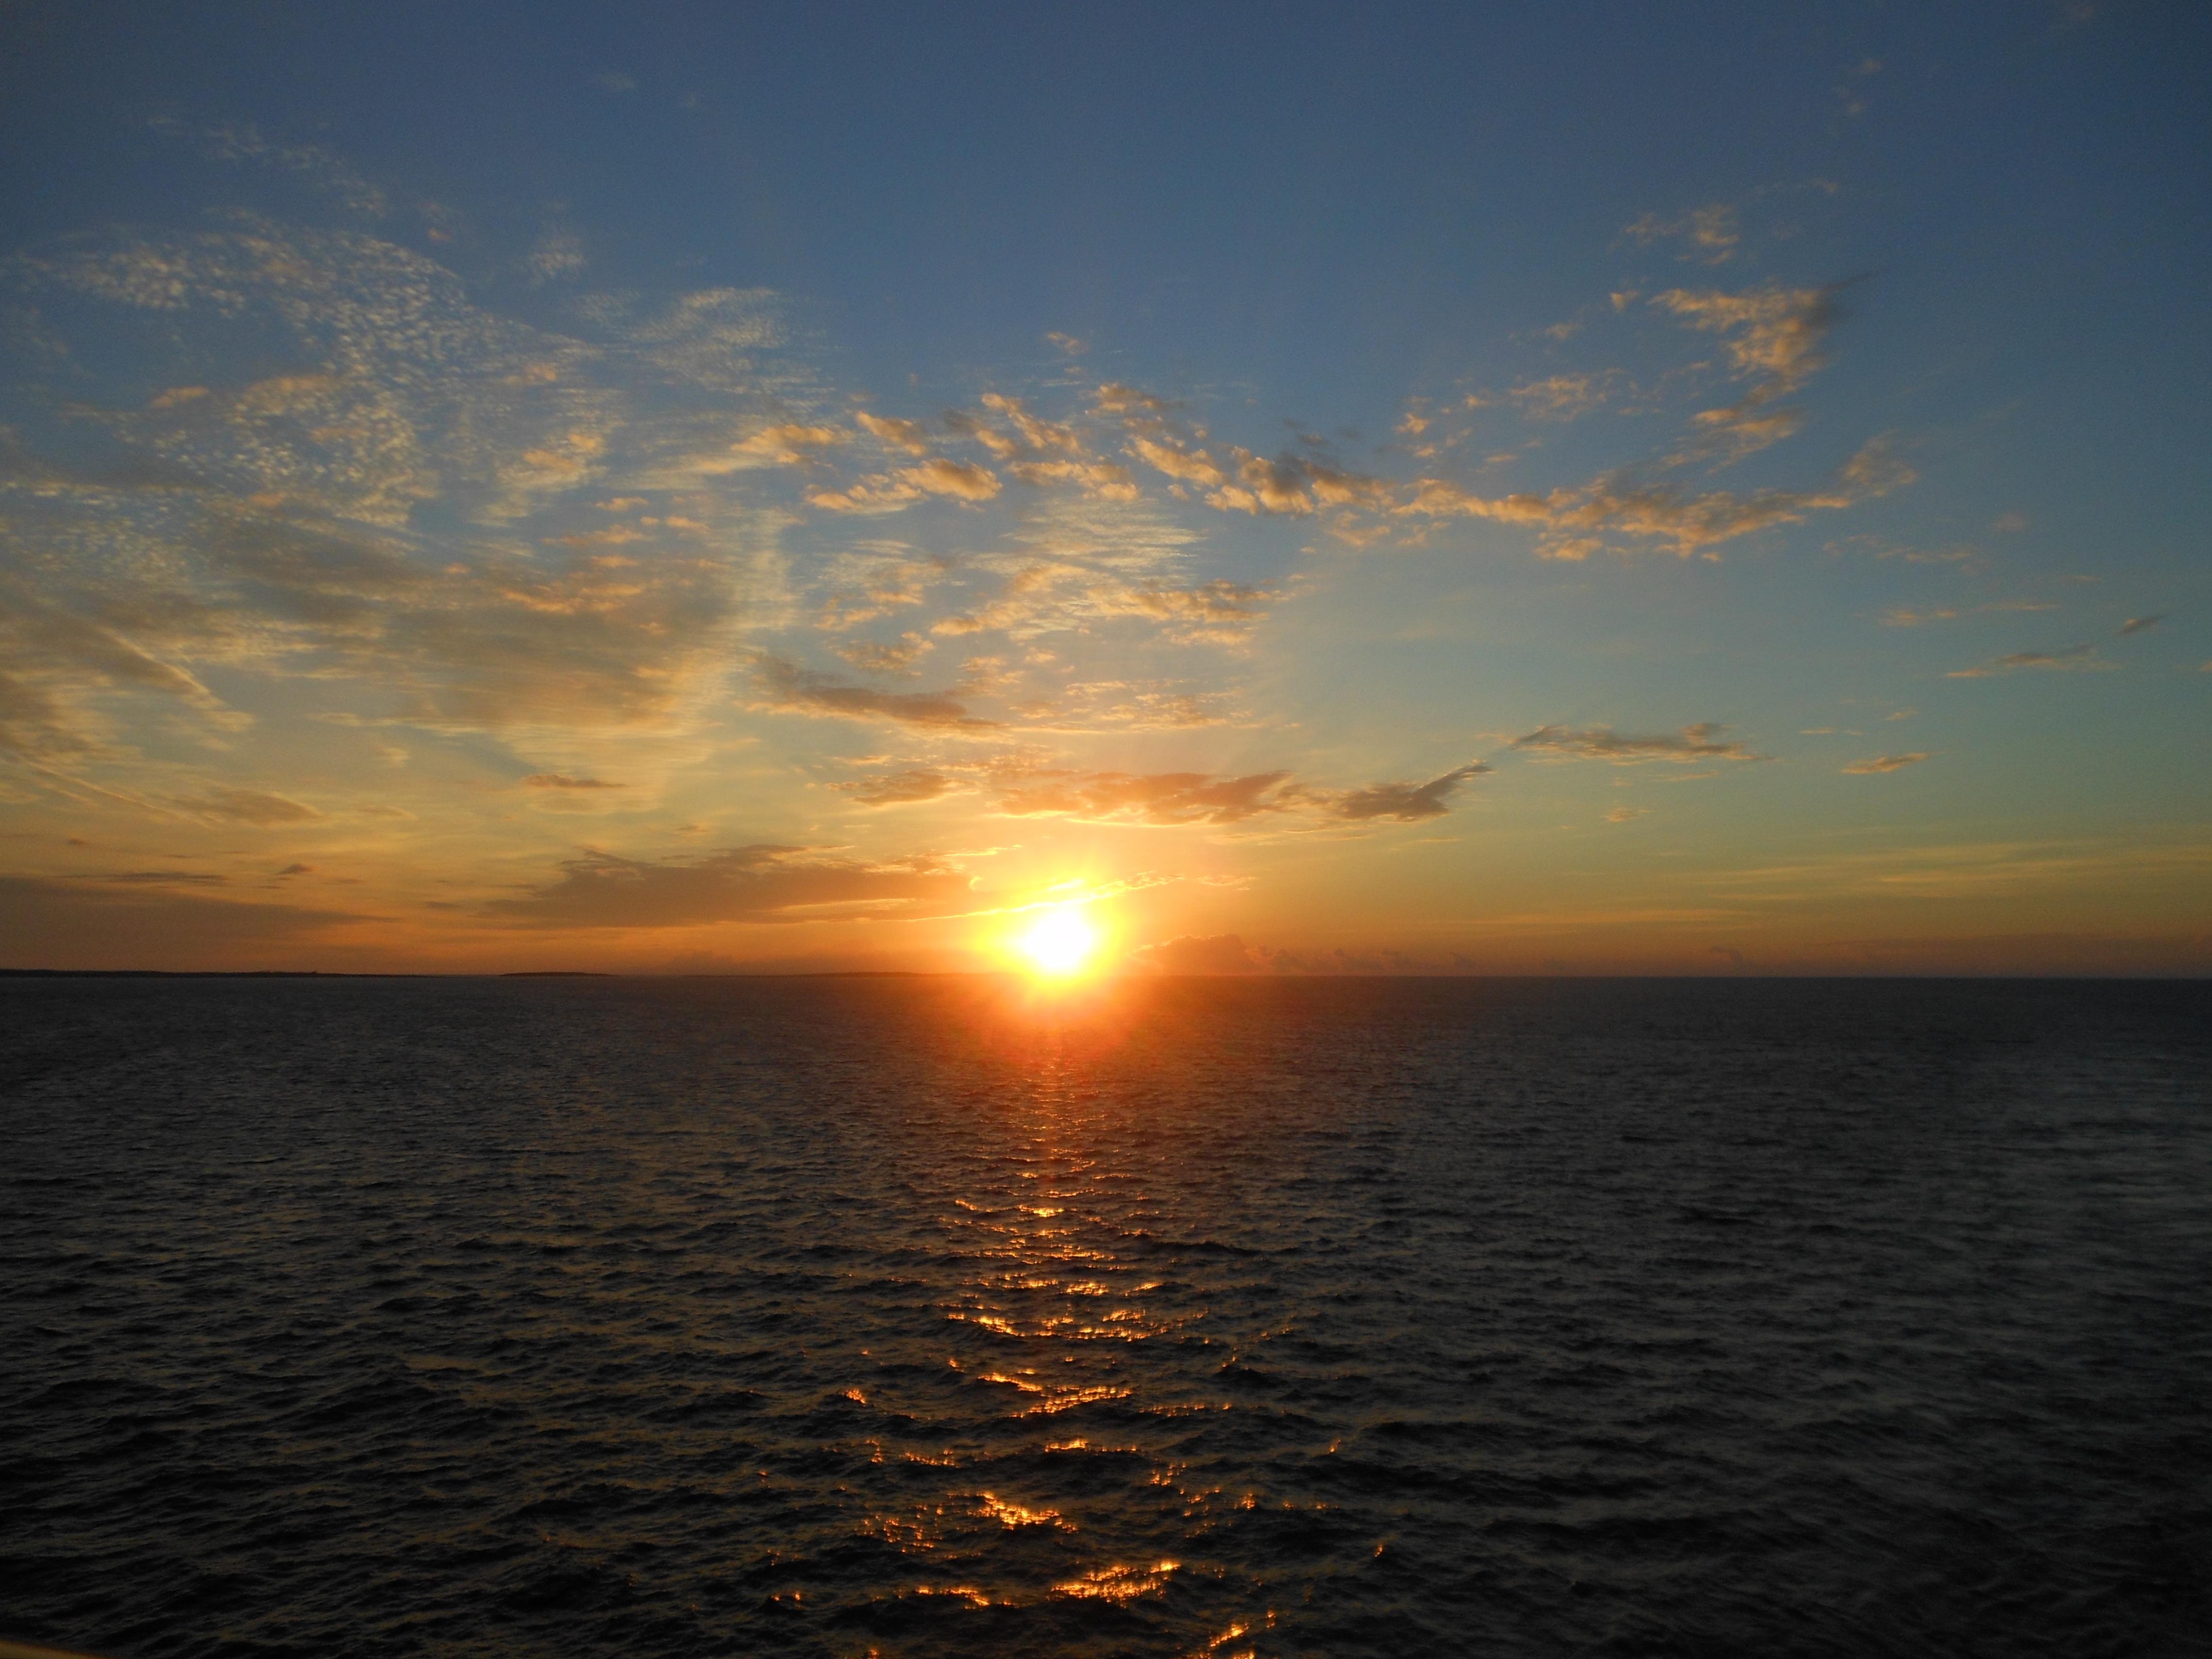 Legal Drinking Age On Cruise To Bahamas